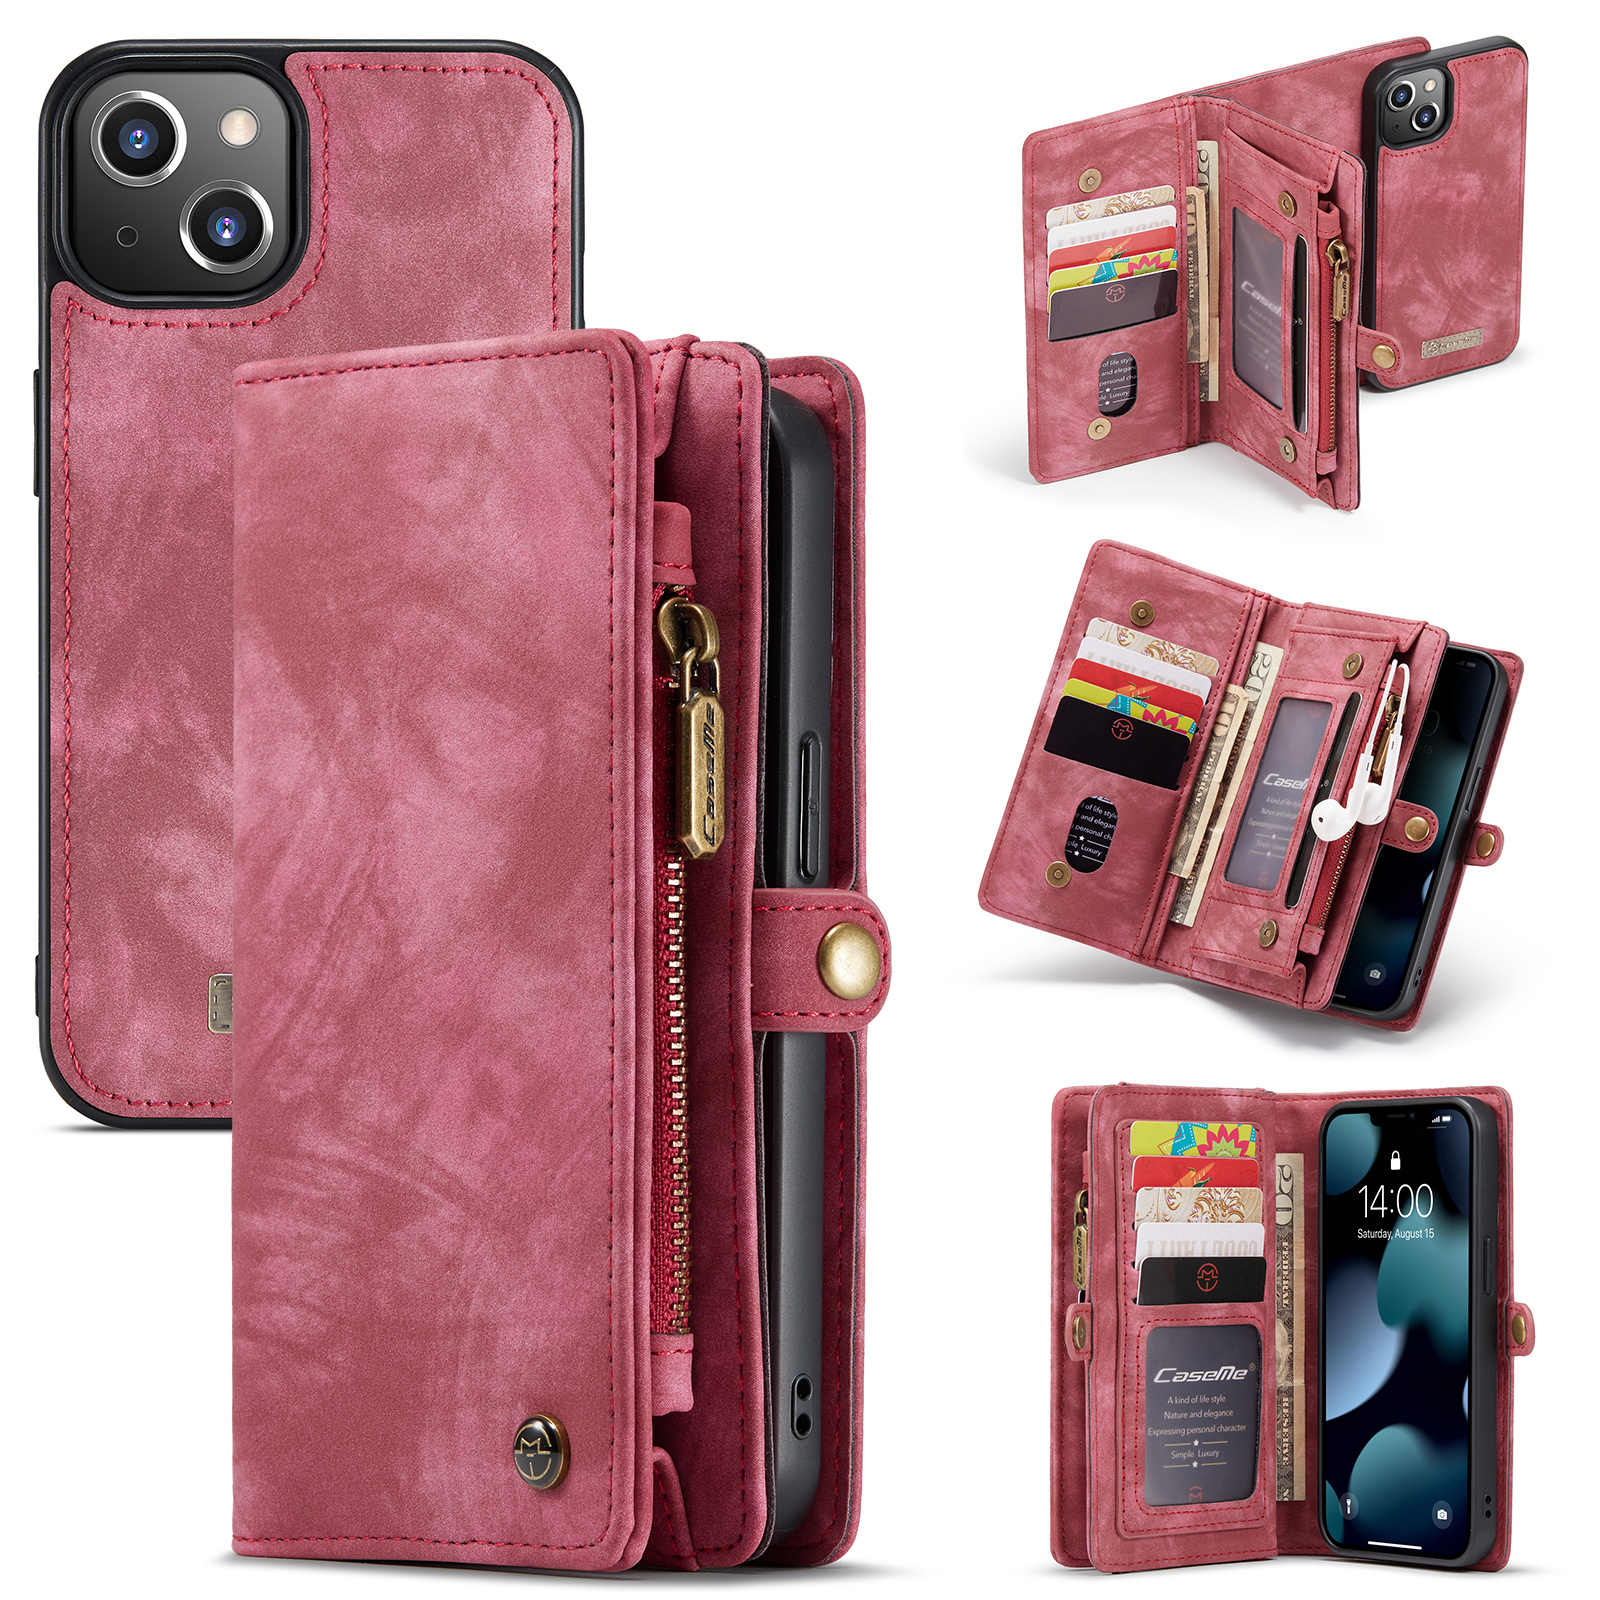 Caseme vintage 2 in 1 portemonnee hoes - iPhone 13 - Rood